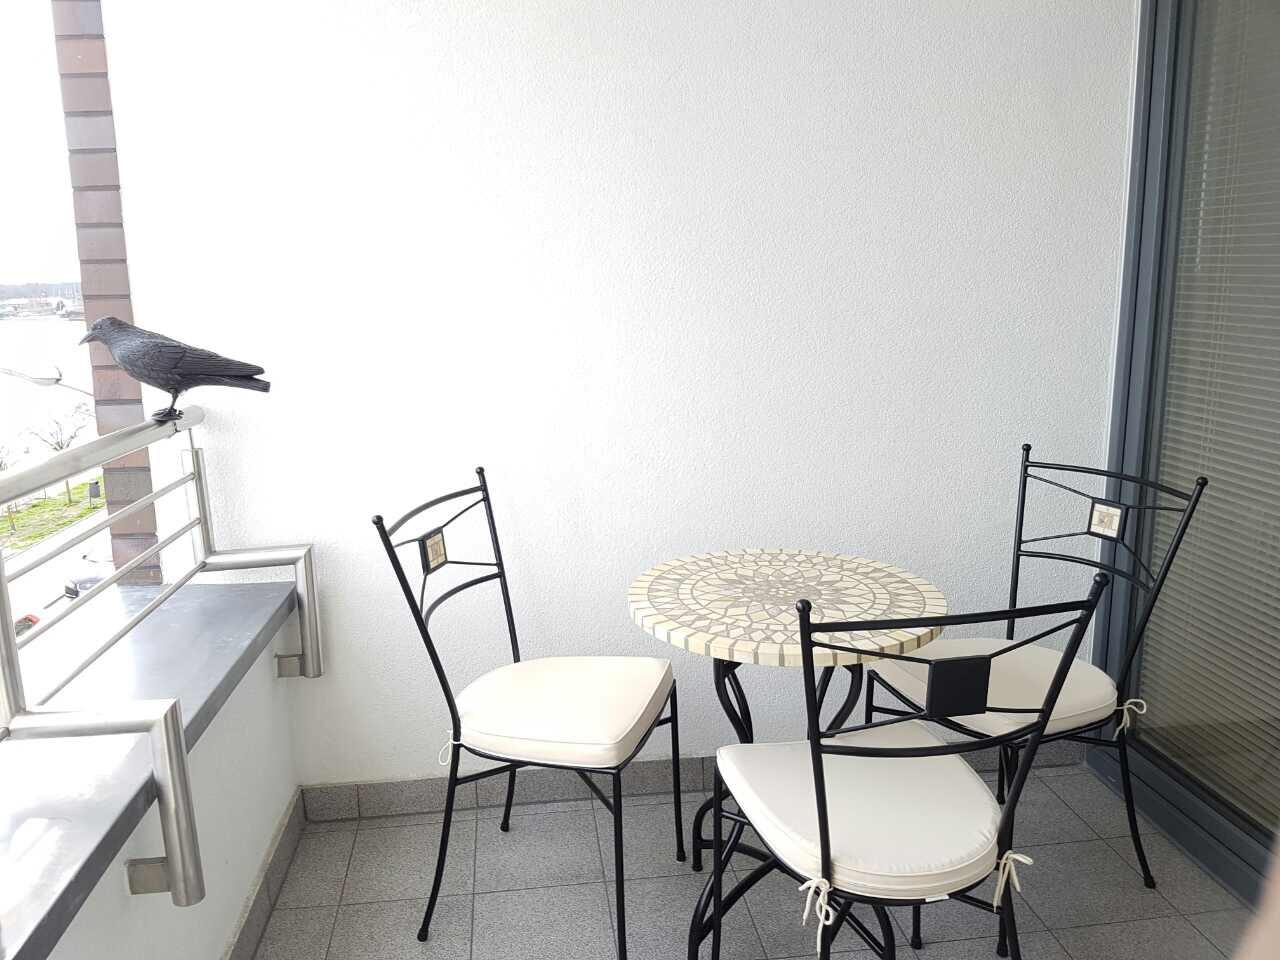 Lägenhet 5 - Balkong